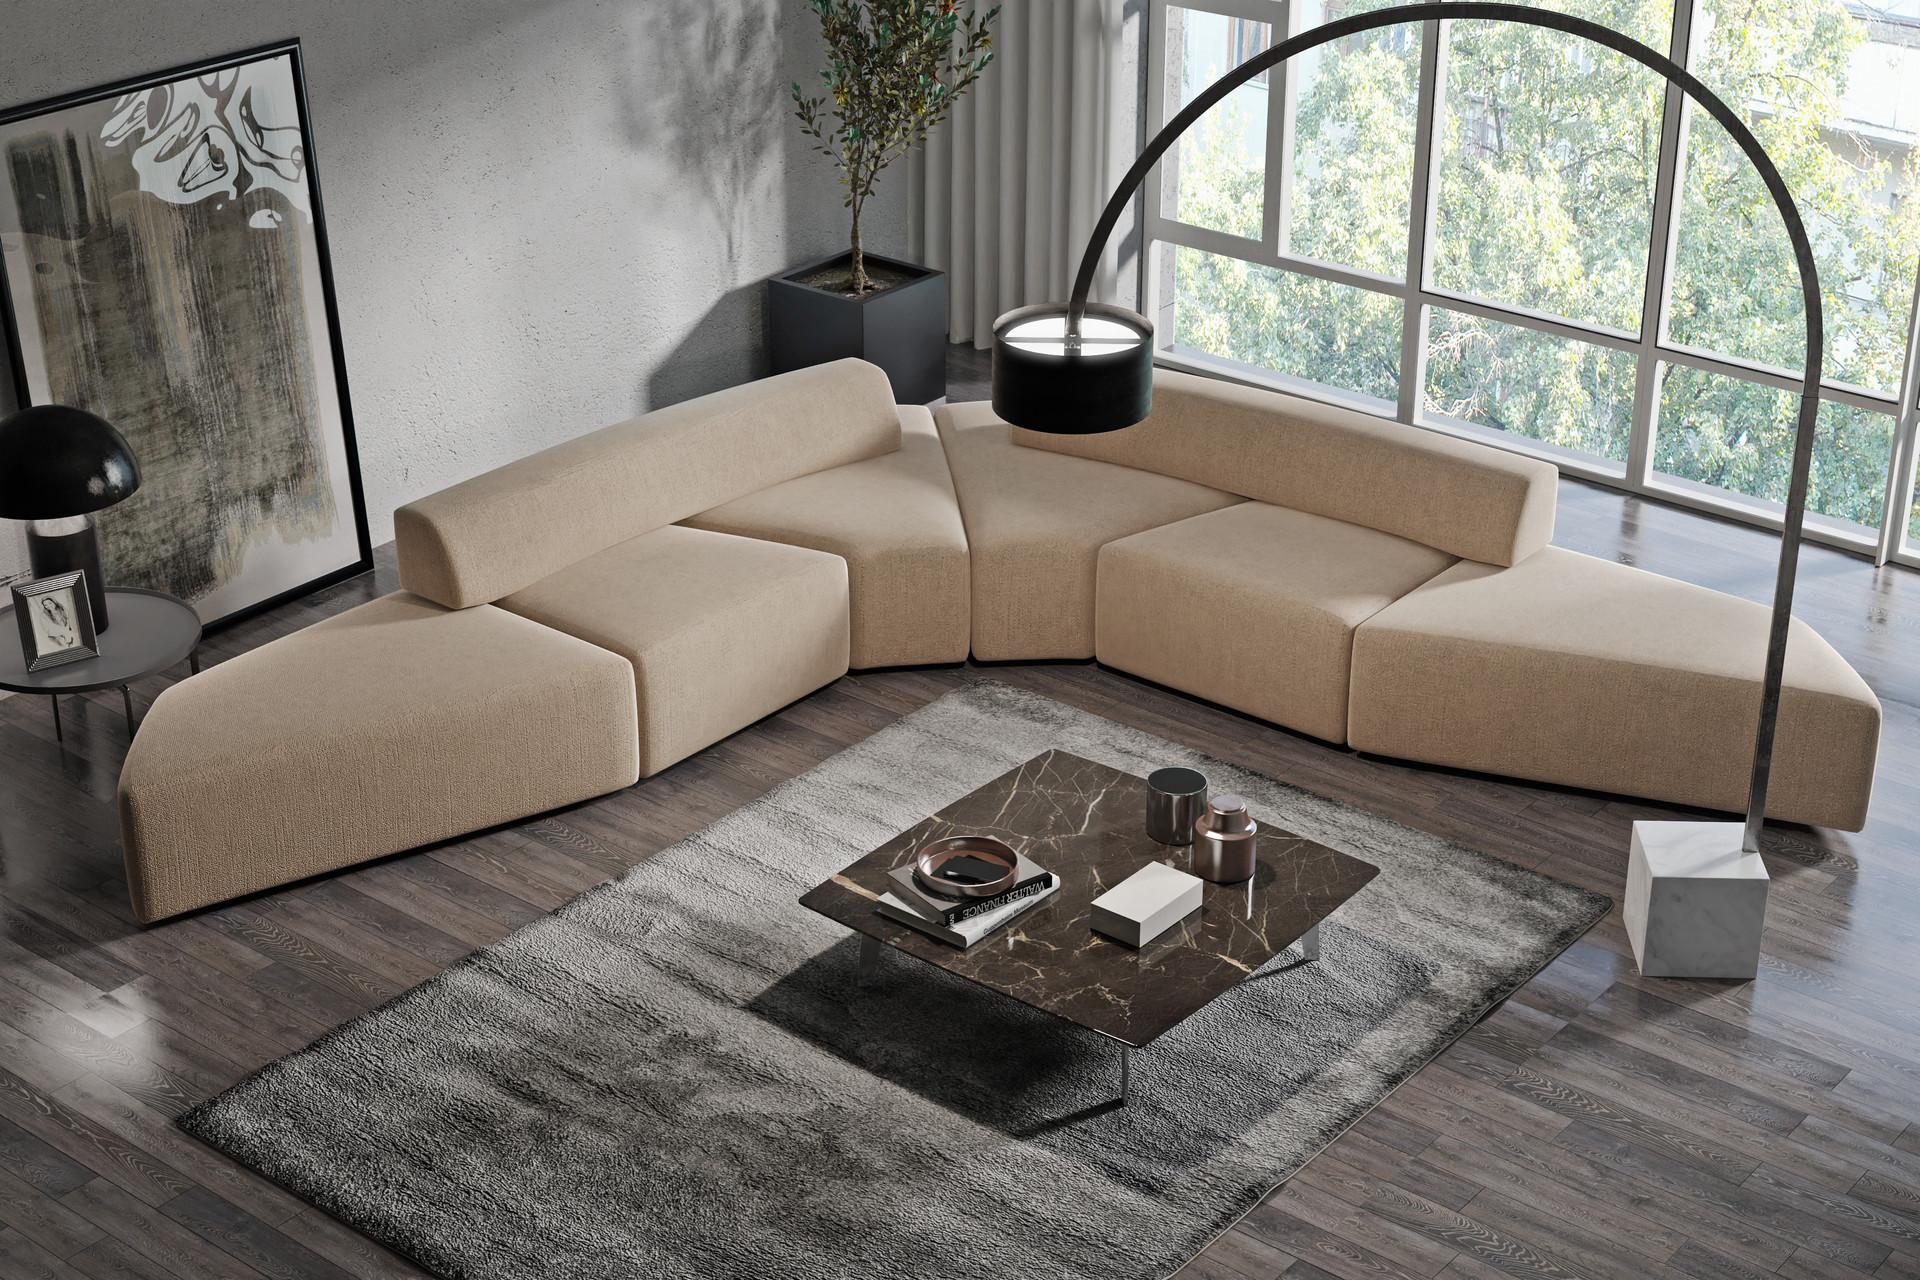 Sofa Constellation_scena_HR.jpg